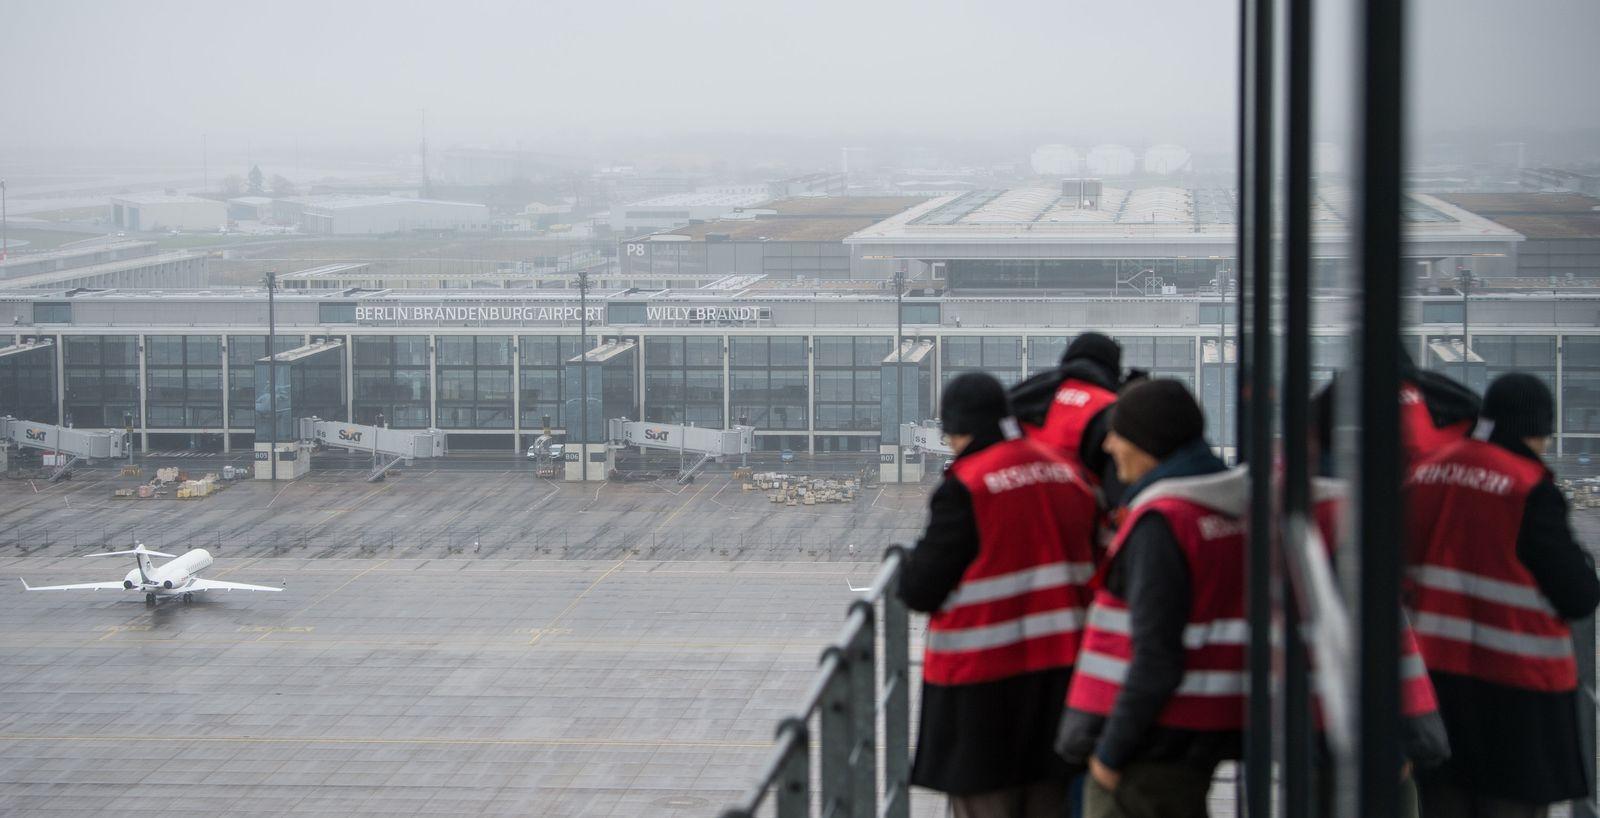 BER / Flughafen Berlin Brandenburg / Masterplan BER 2040